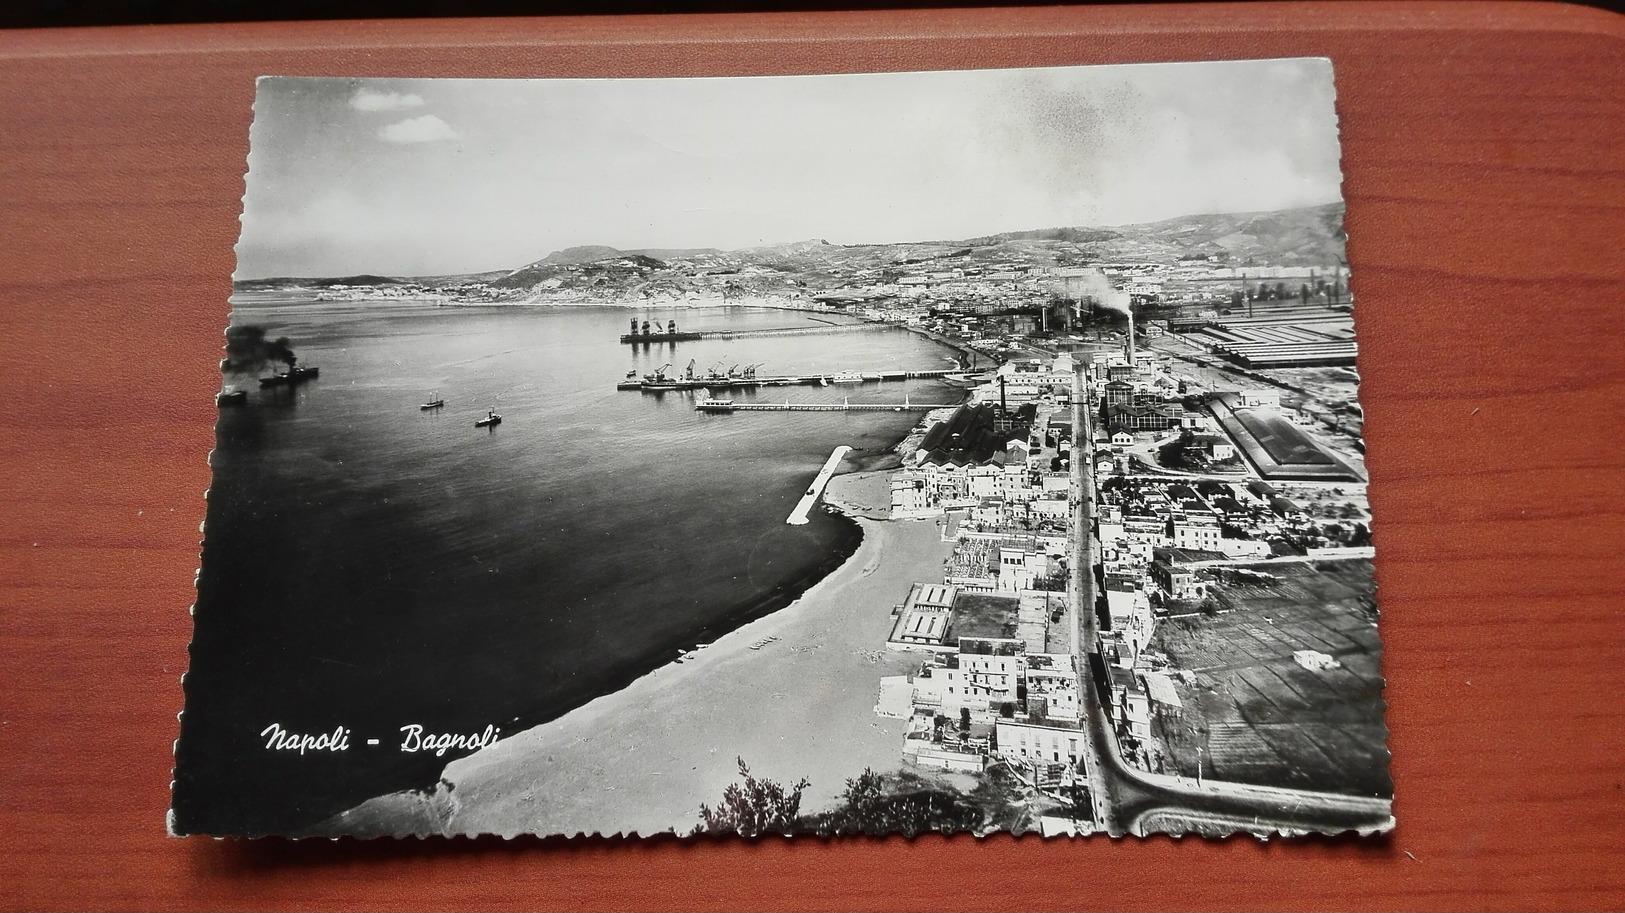 Napoli - Bagnoli - Napoli (Naples)